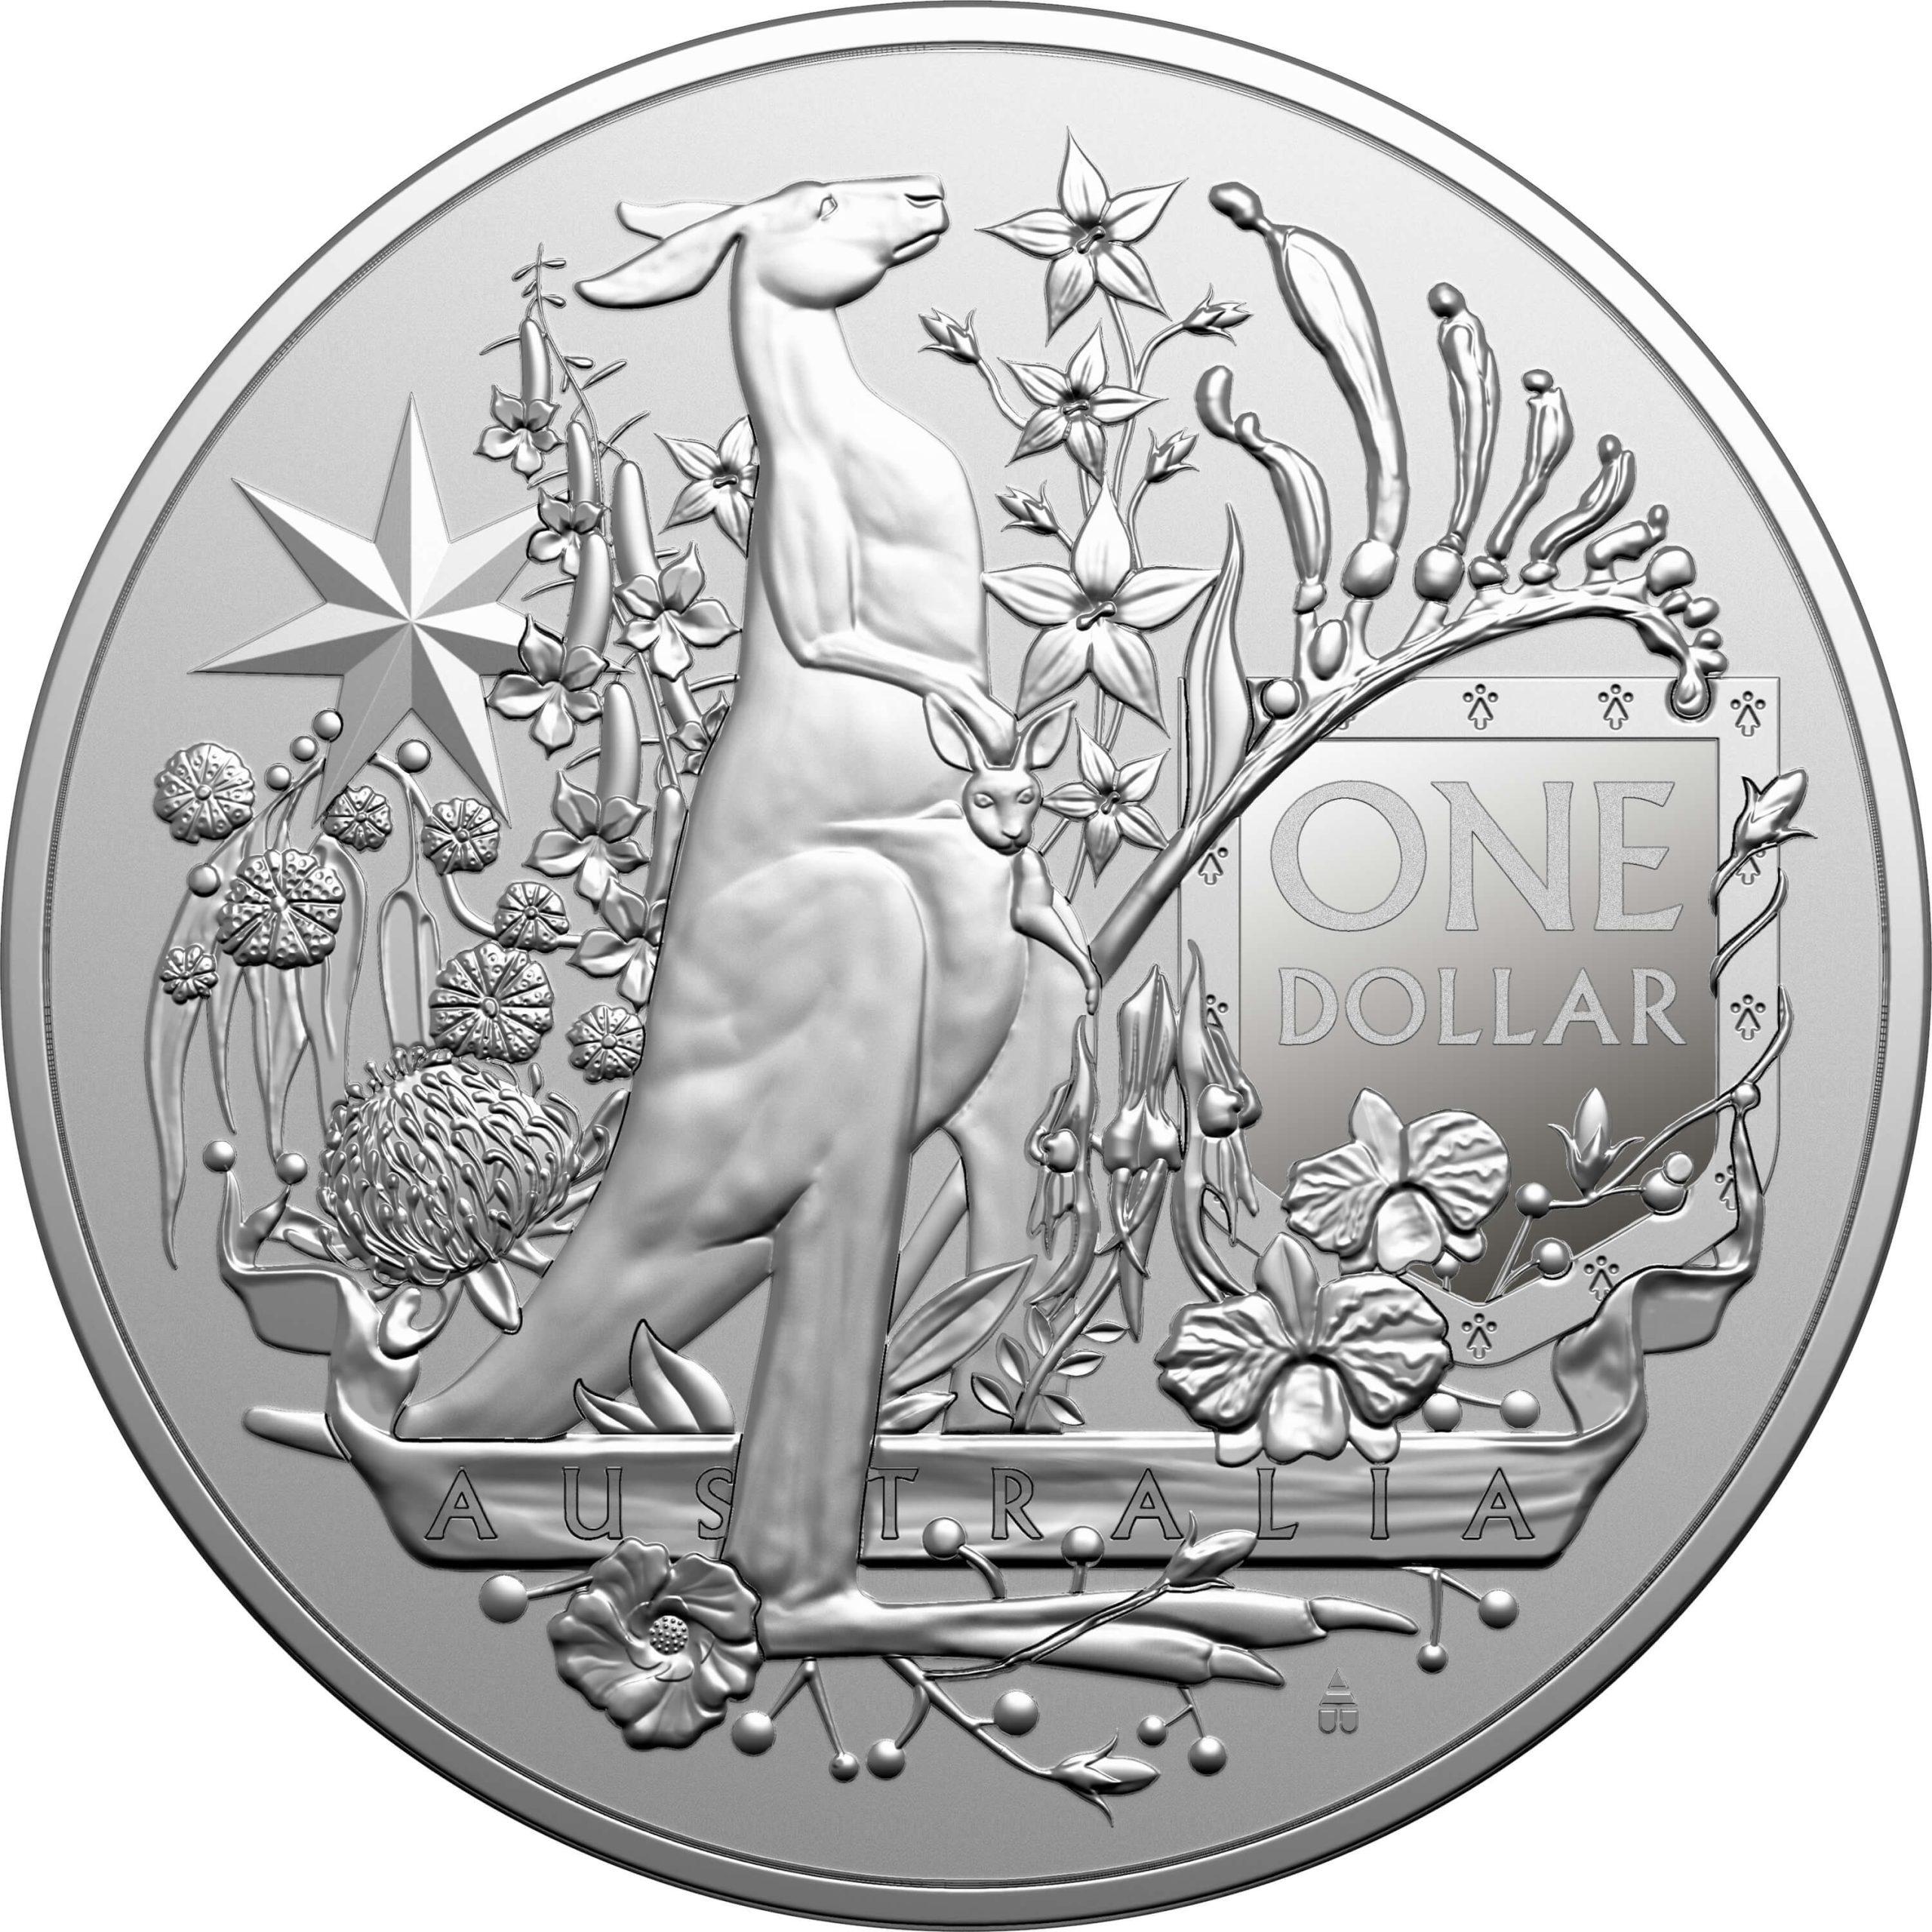 2021 Australia's Coat of Arms 1oz .999 Silver Bullion Coin 1